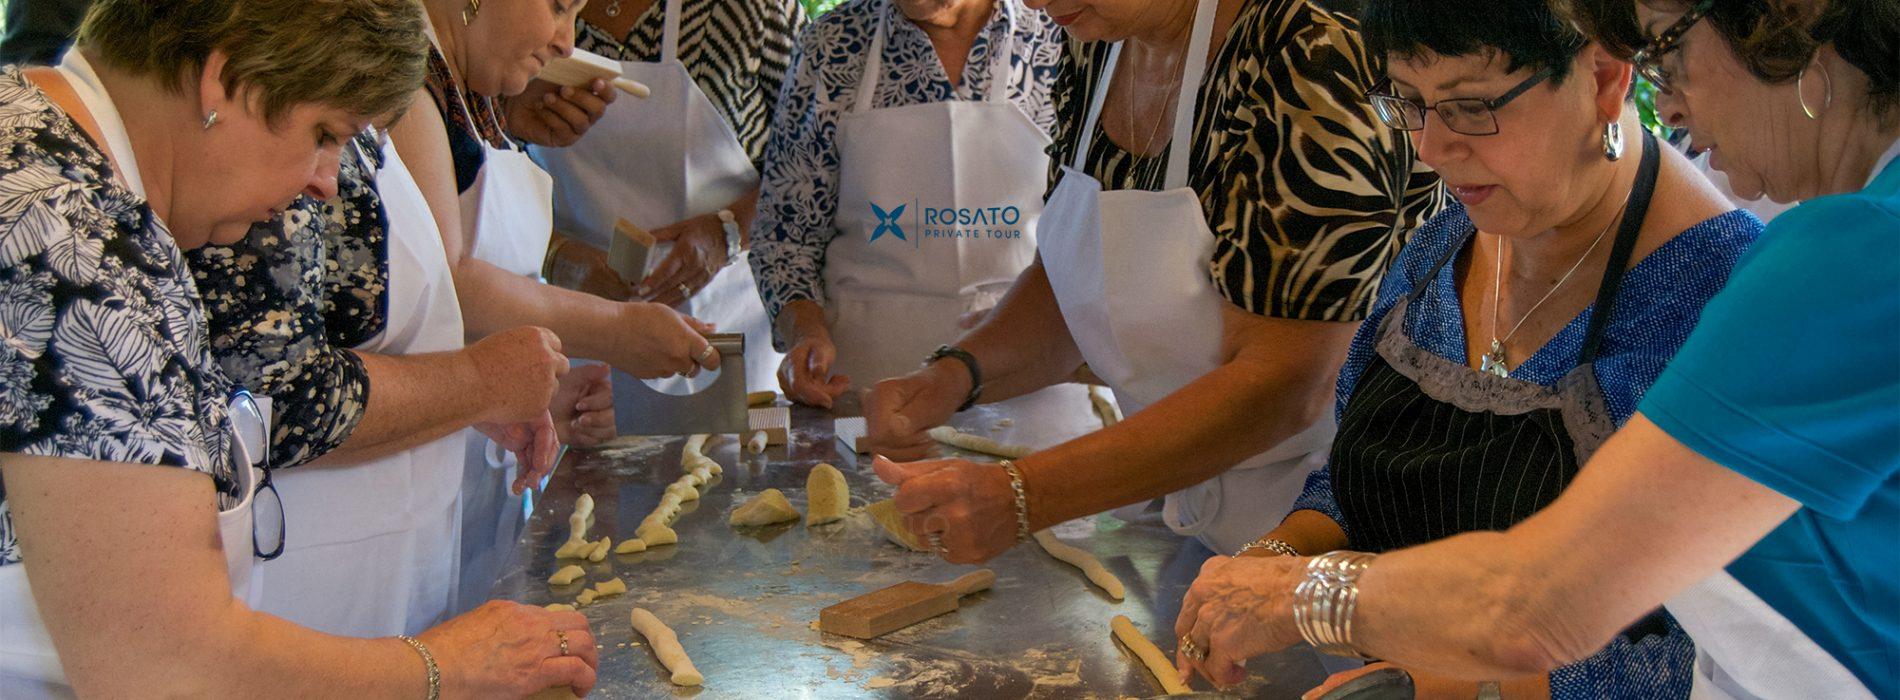 Food Tour Italian Family from Sorrento